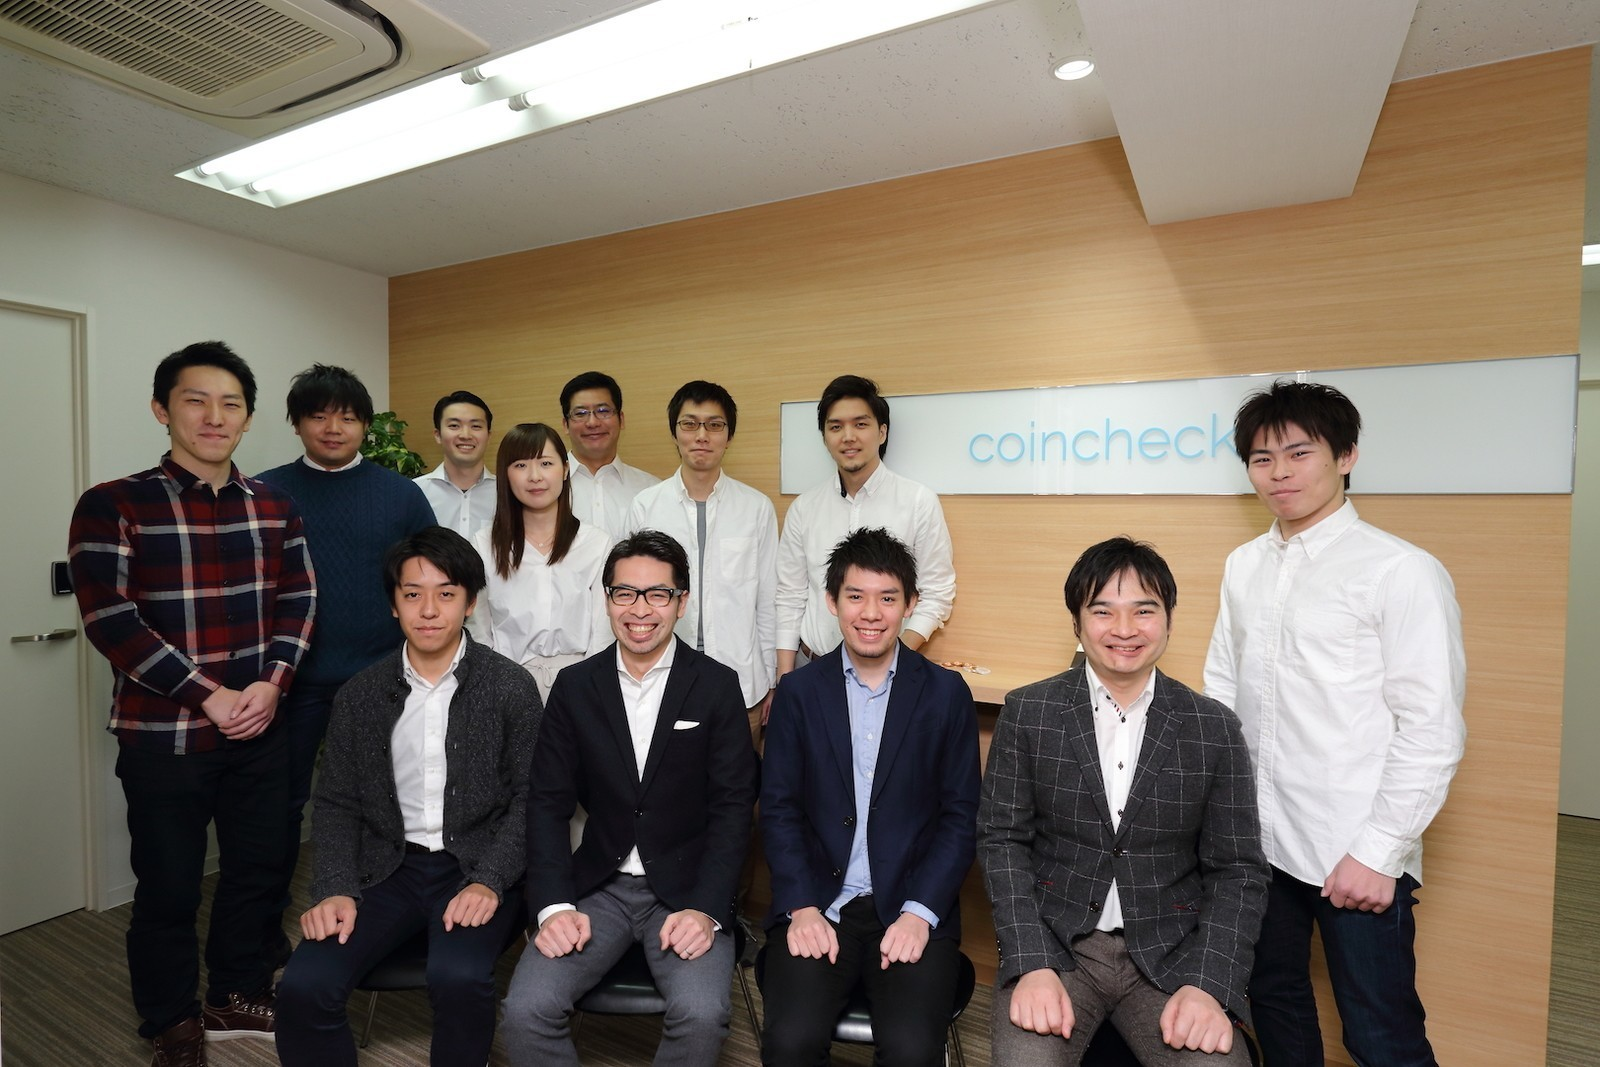 Fintechの最前線!仮想通貨取引所「Coincheck」を開発するWEBエンジニア募集!